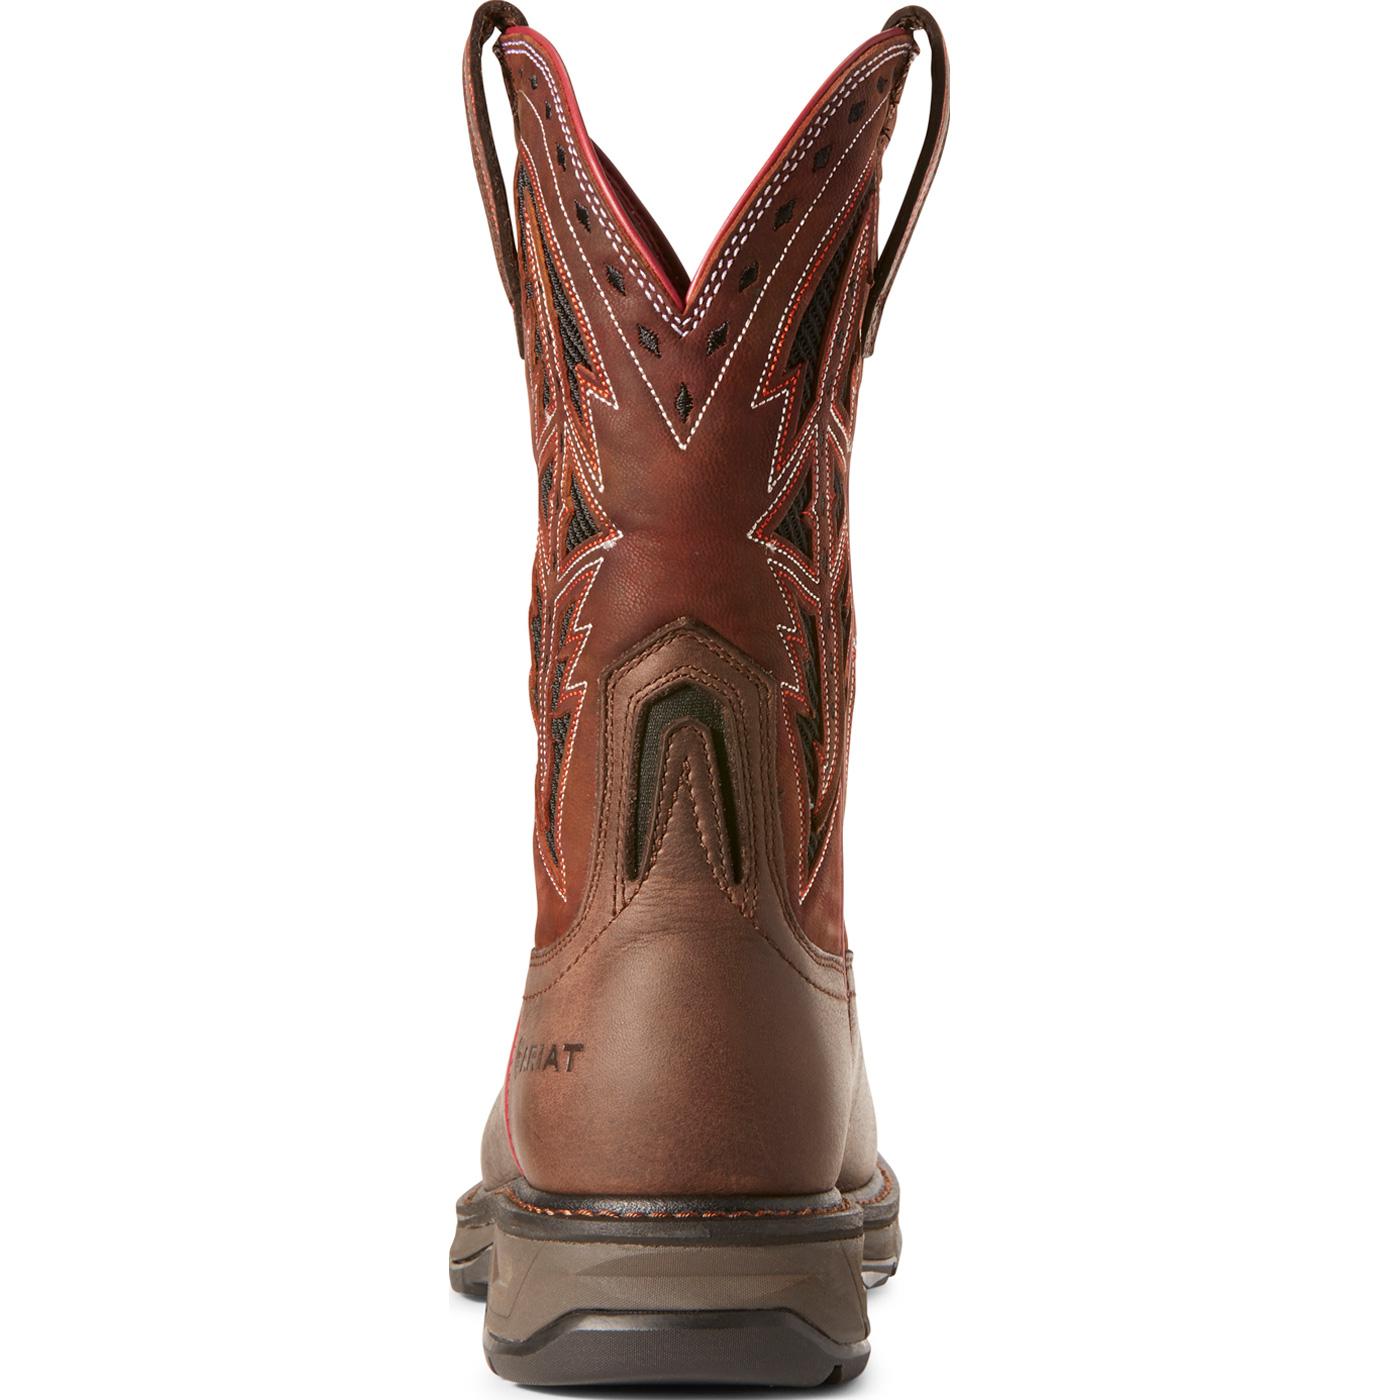 44338bed490 Ariat WorkHog XT Spear Men's 11 inch Carbon Fiber Toe Electrical Hazard  Western Work Boot